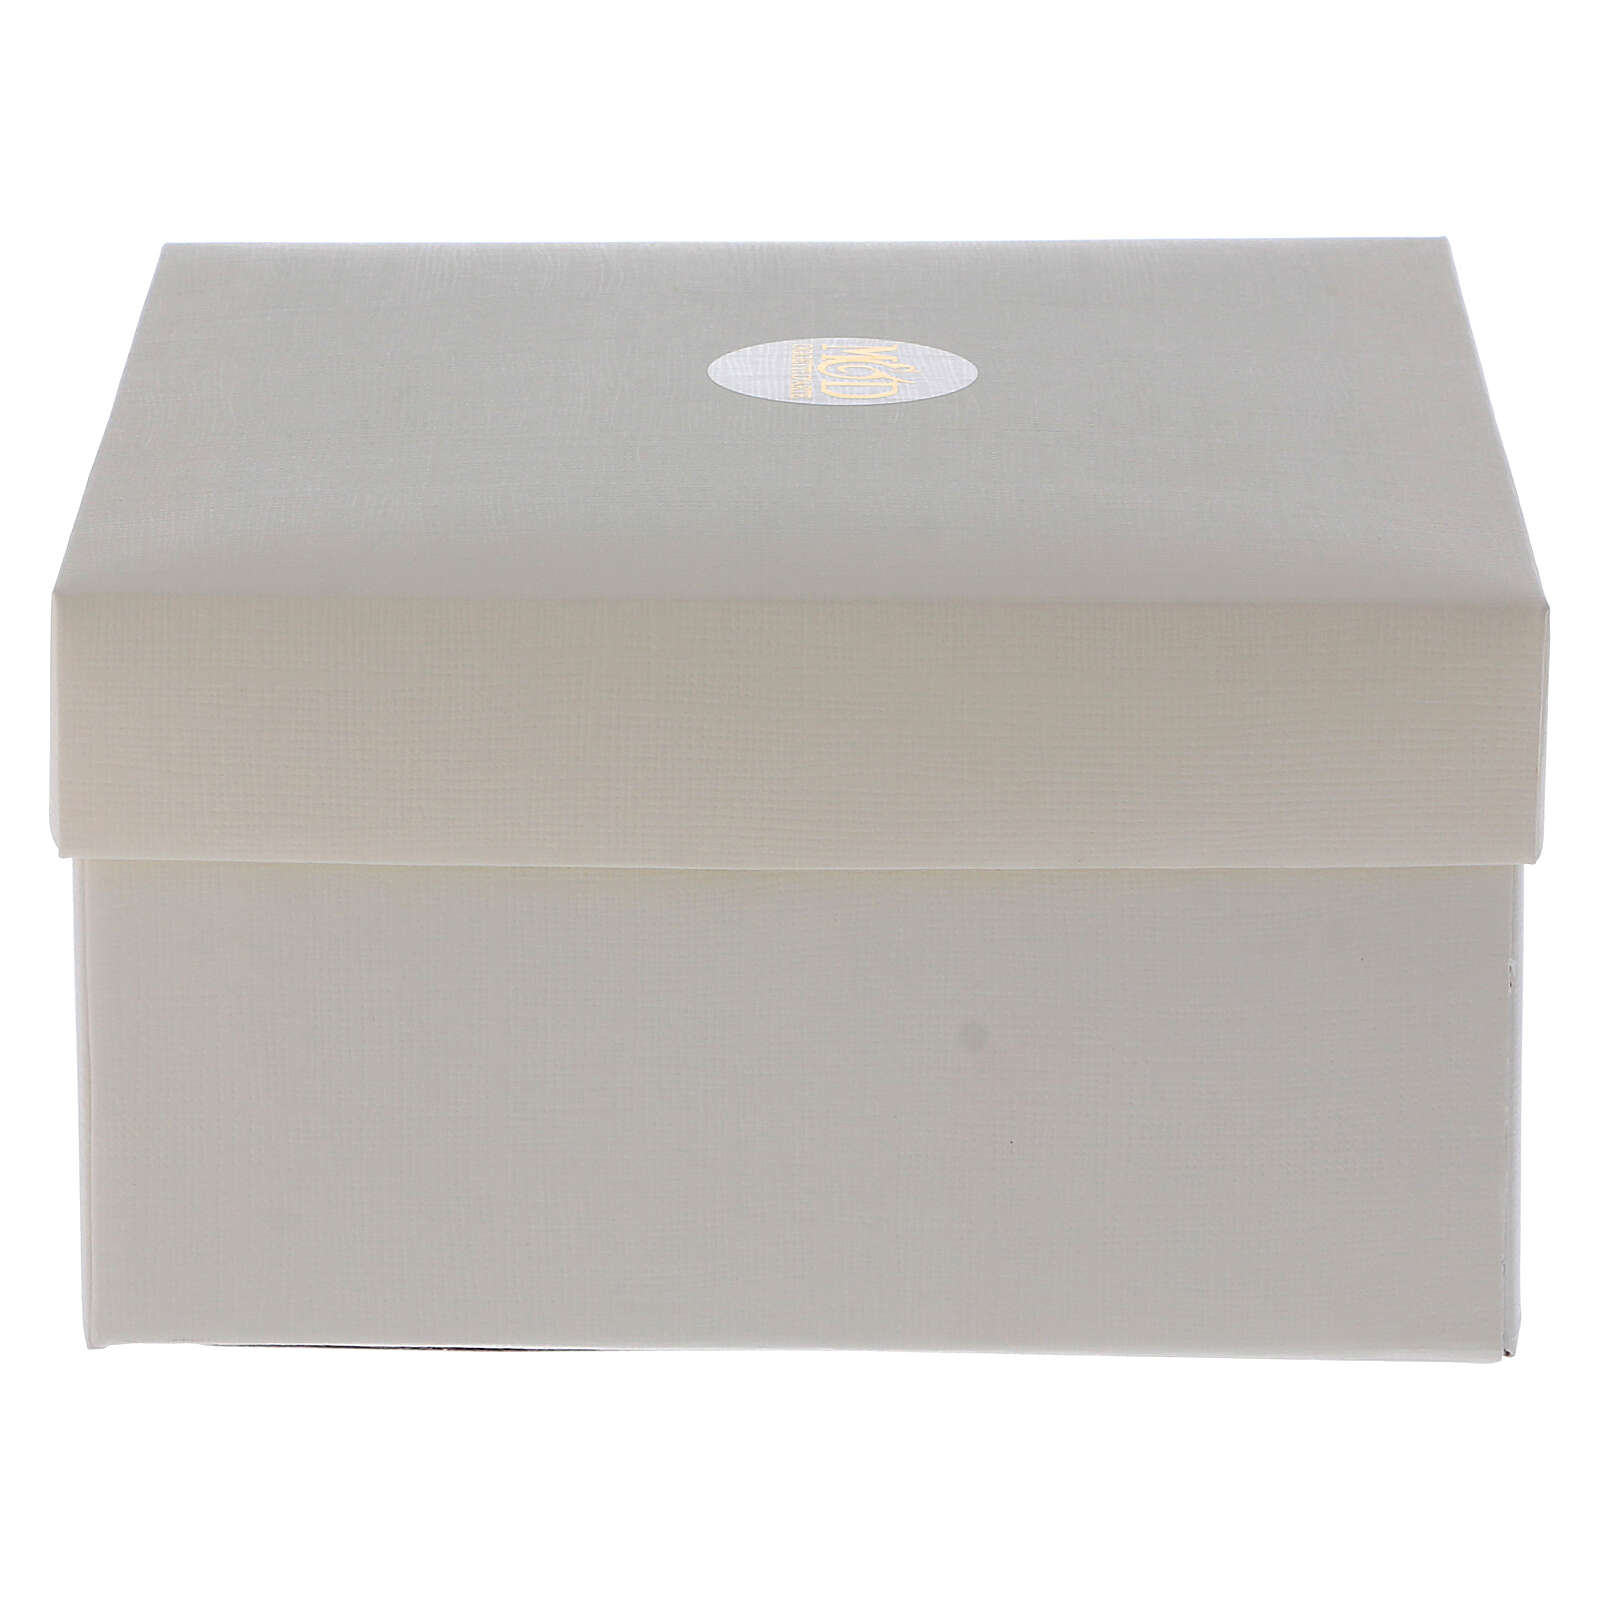 Portafoto nozze d'argento 17x17 cm fedi intrecciate 3